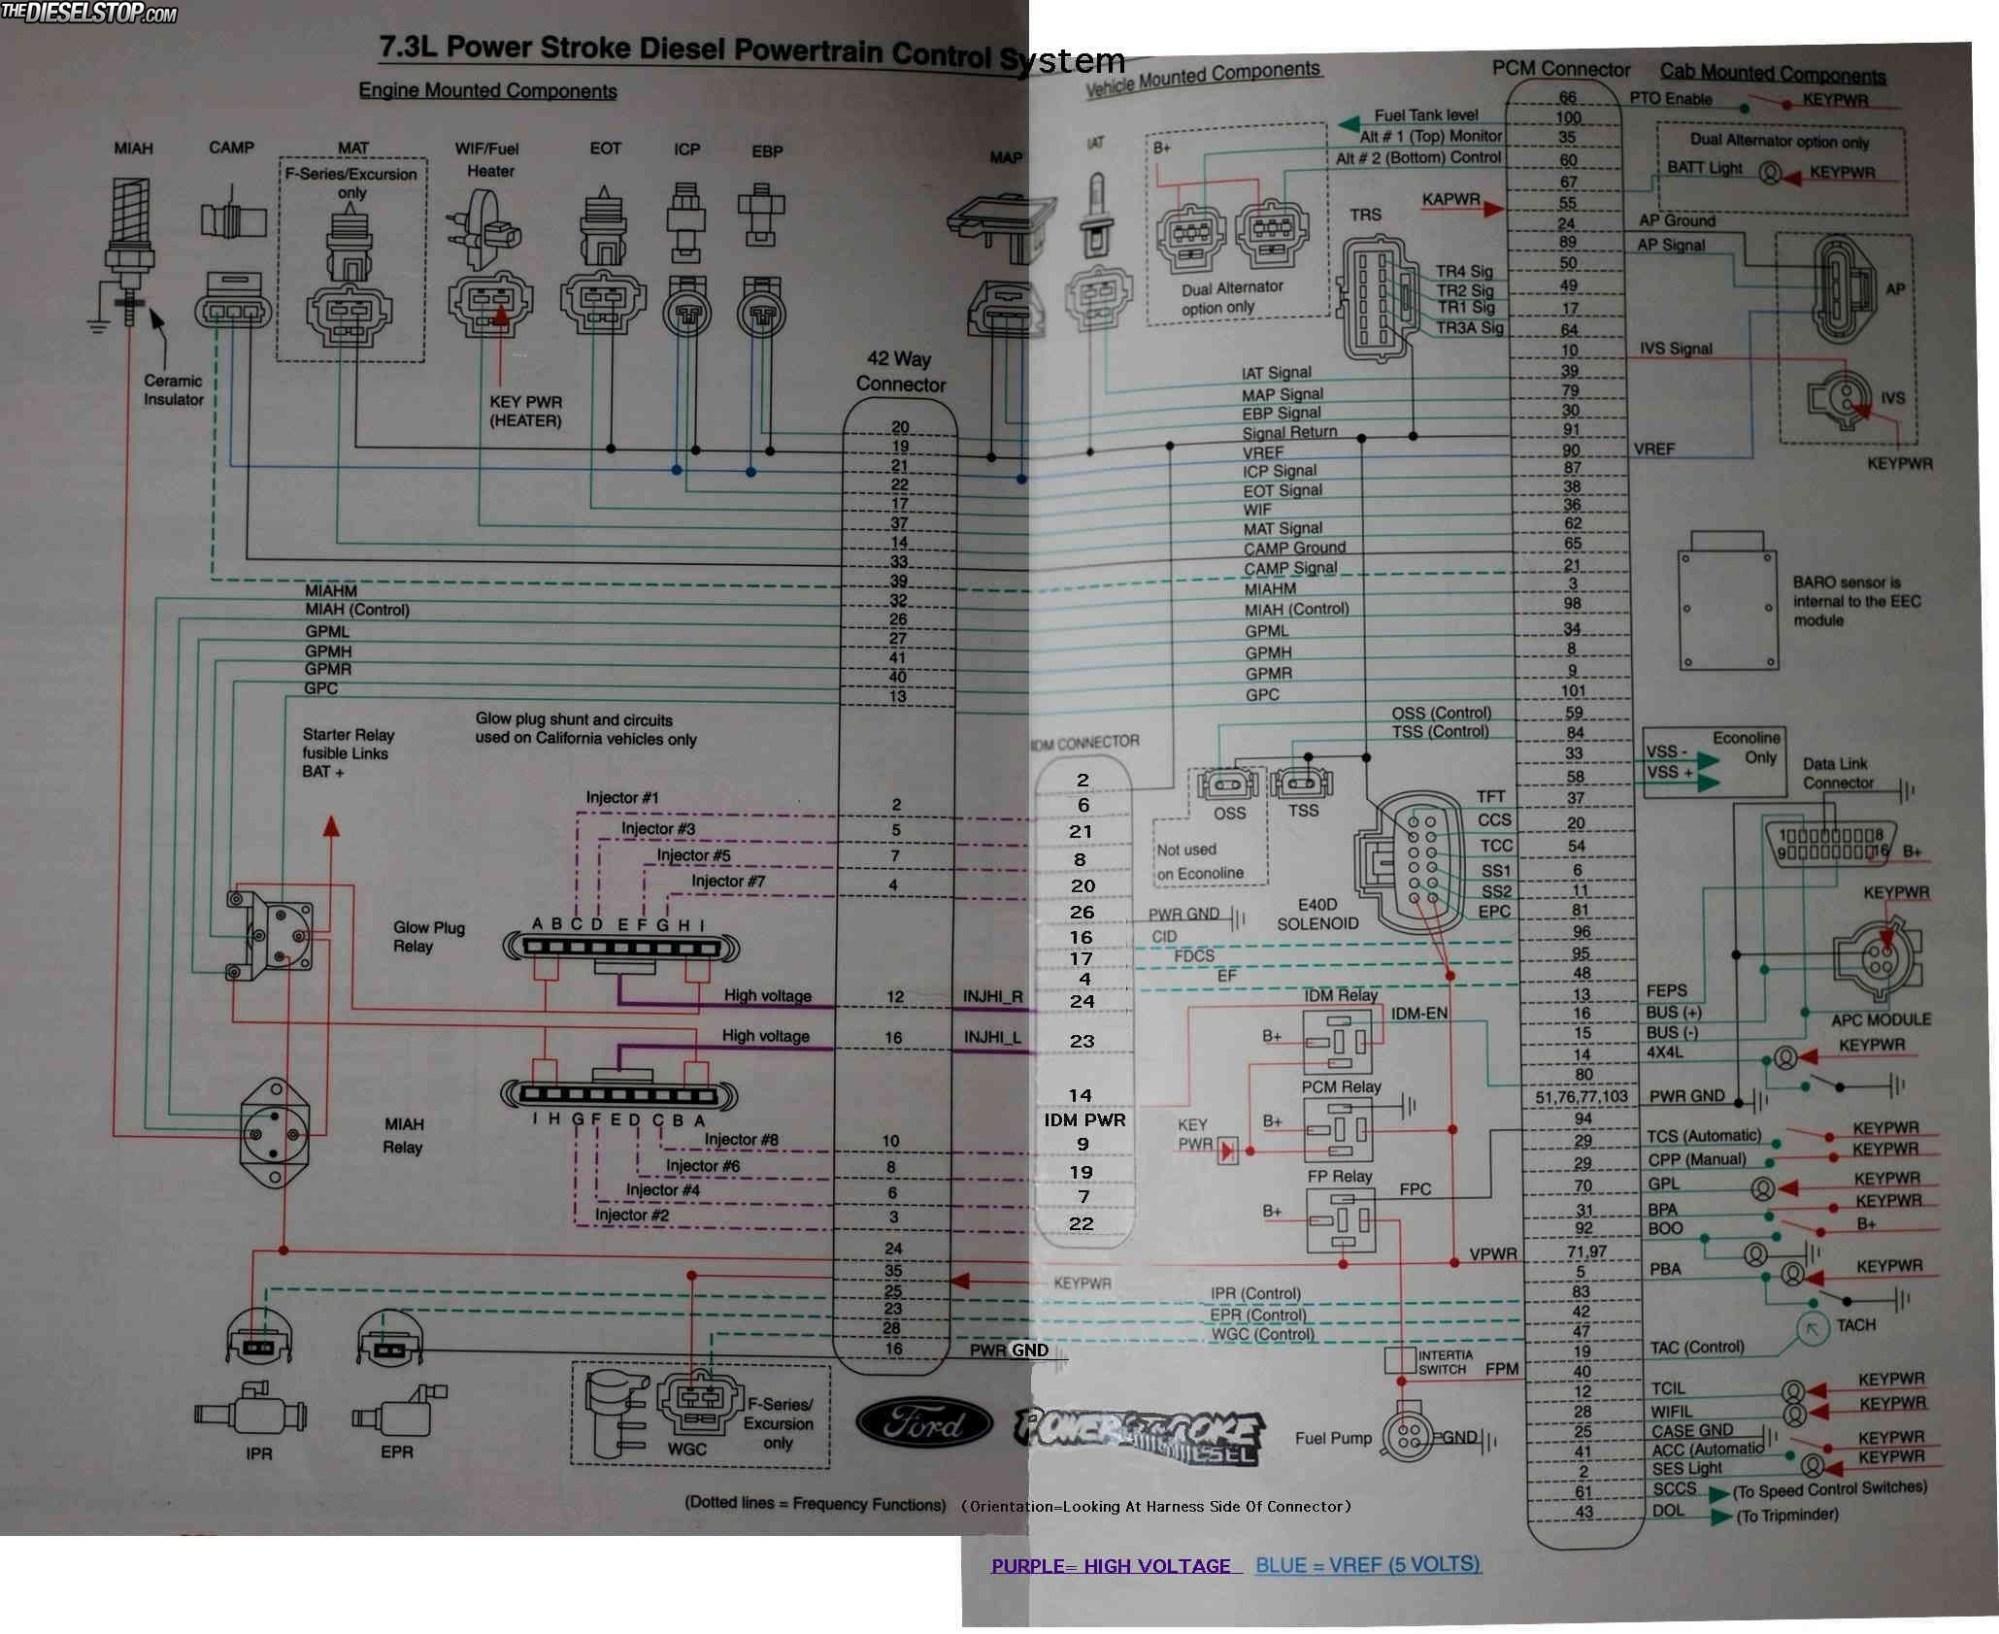 hight resolution of 1999 7 3l engine diagram schematic wiring diagrams 4x4 wiring diagram 7 3 powerstroke diesel engine